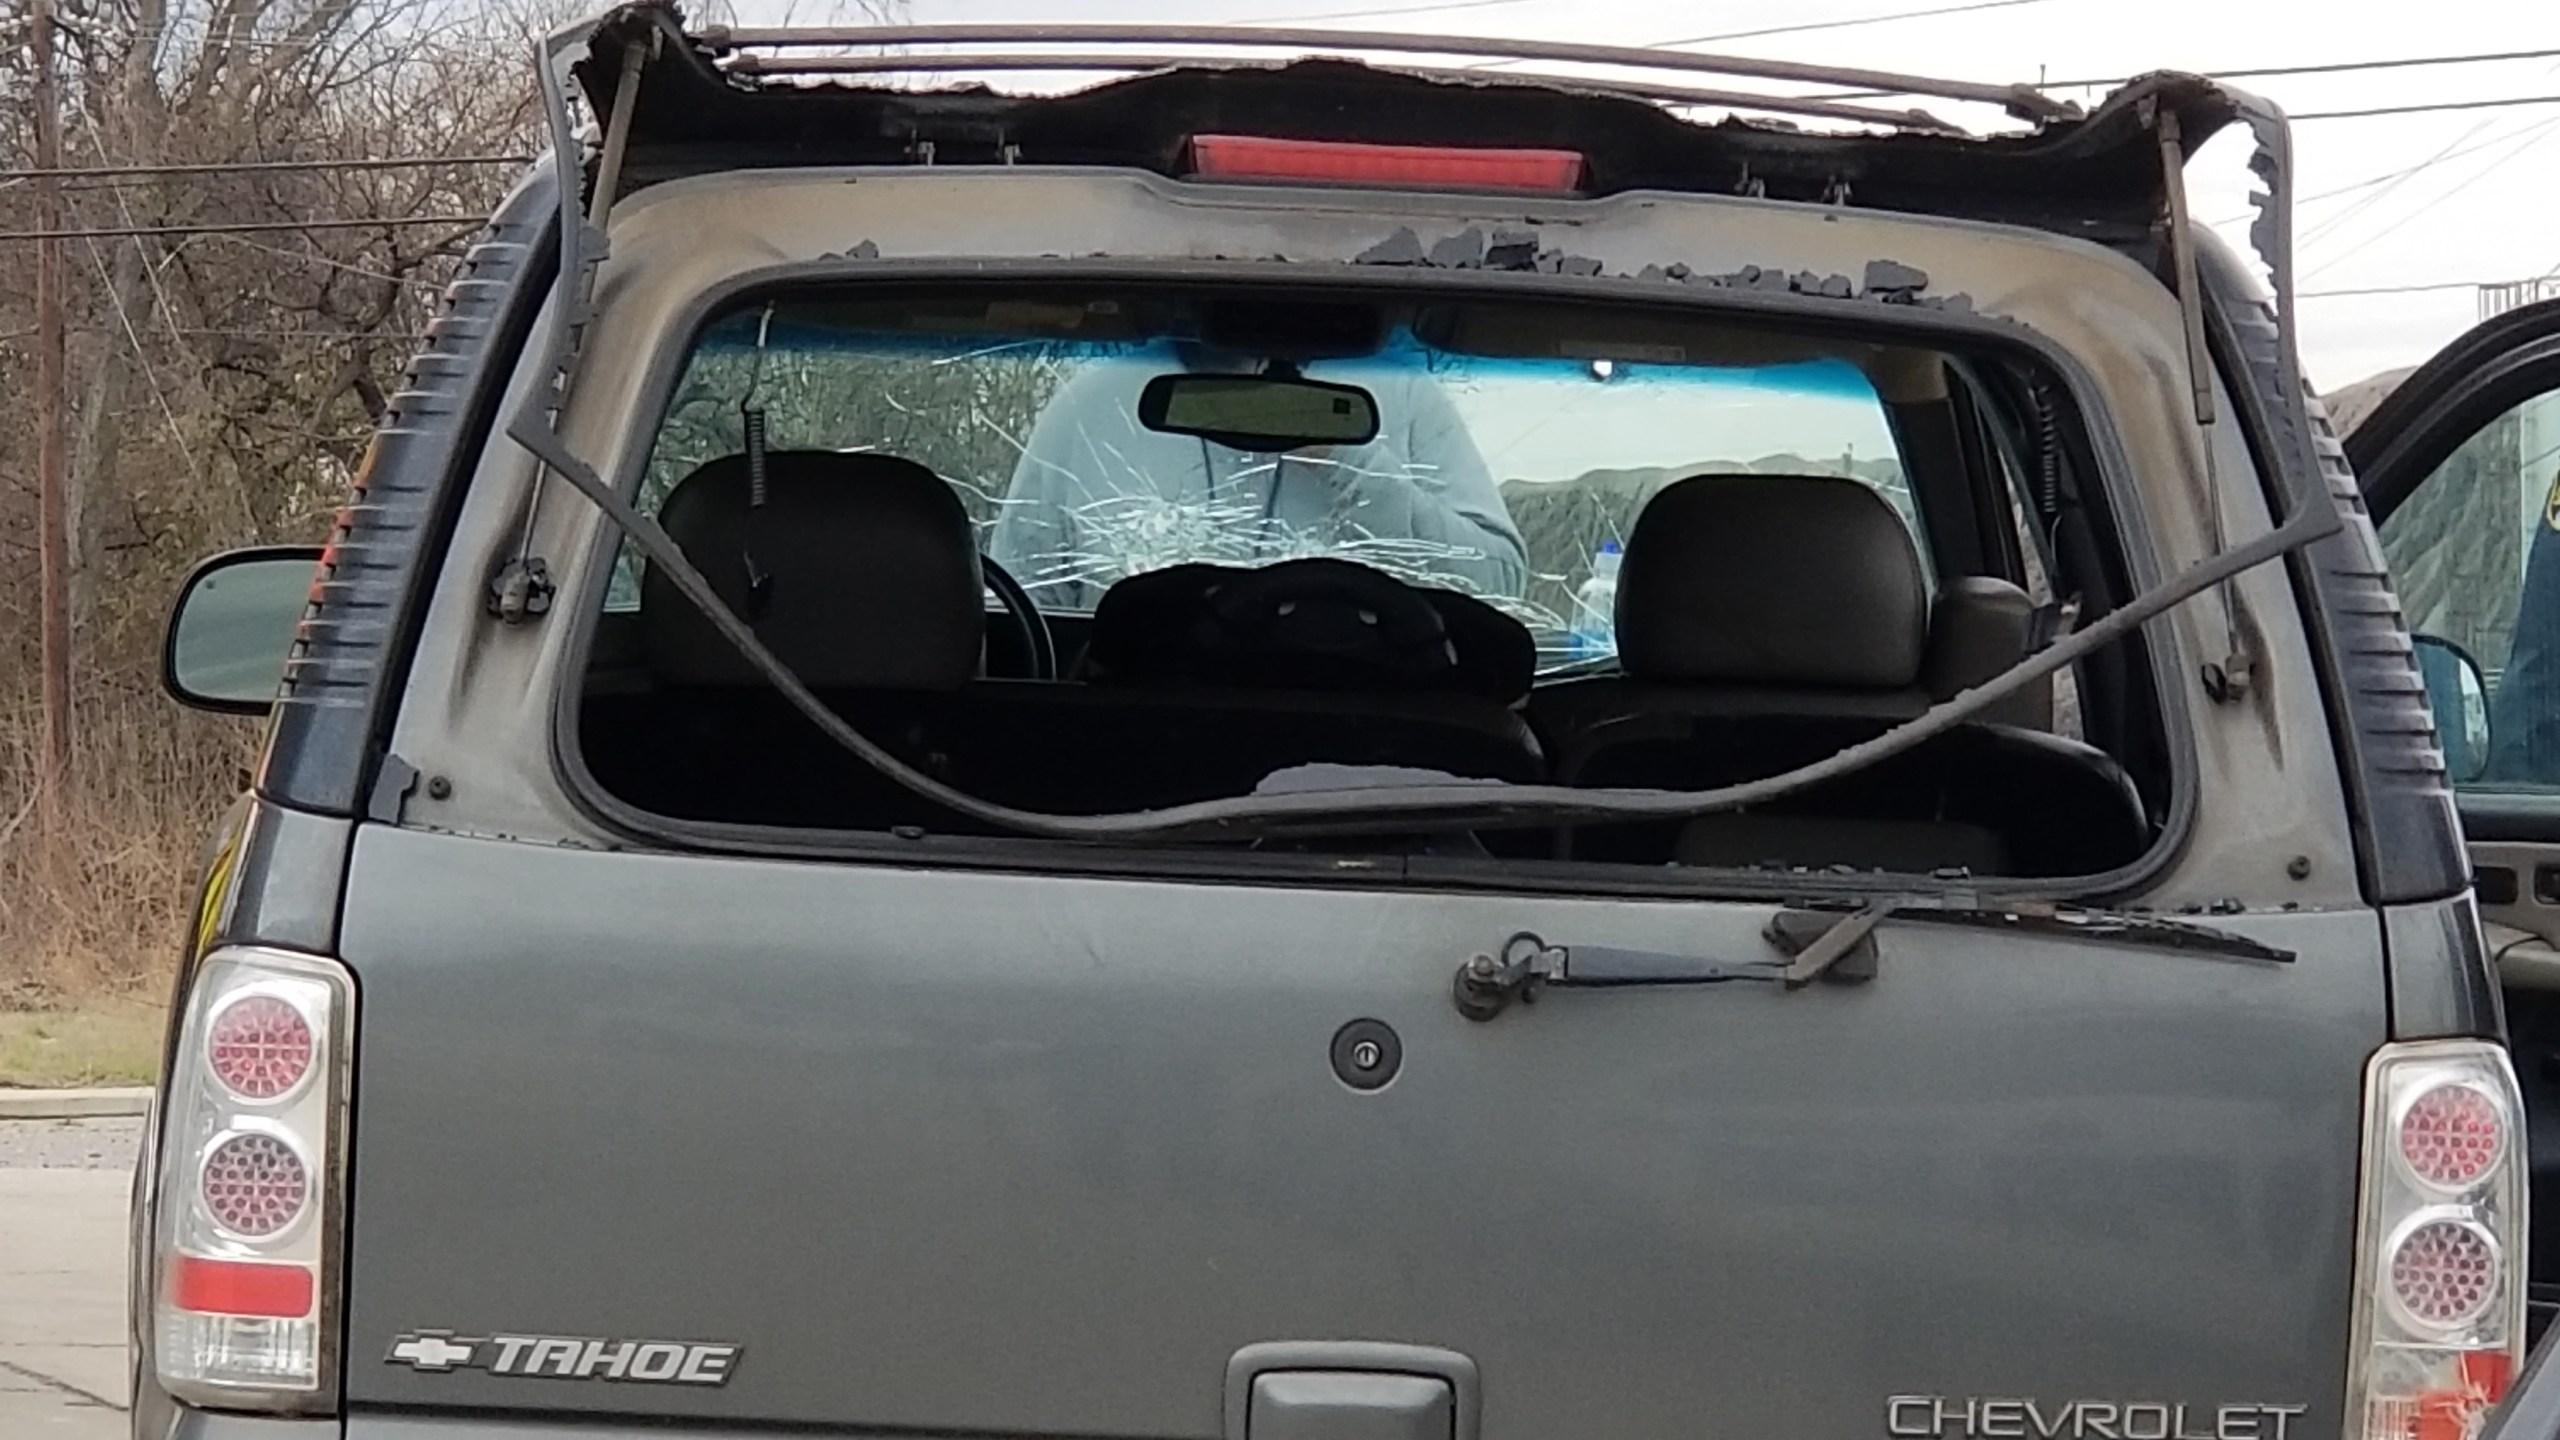 Child grazed, damage to car